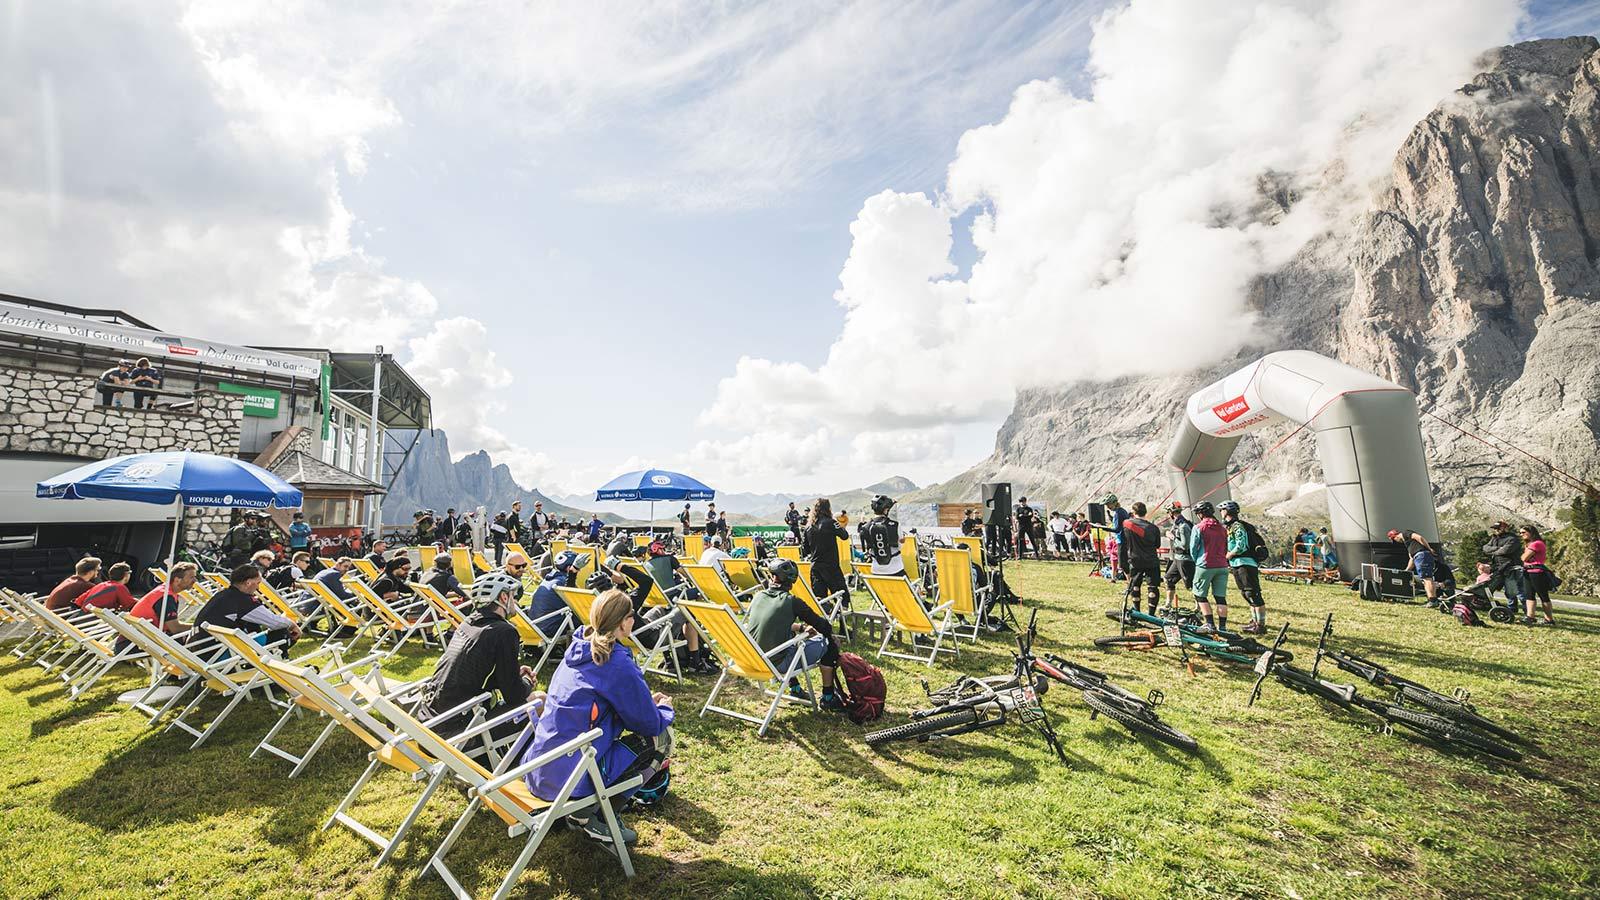 Event Knödeljagd 2021 Gröden Val Gardena - Dolomiten Panorama